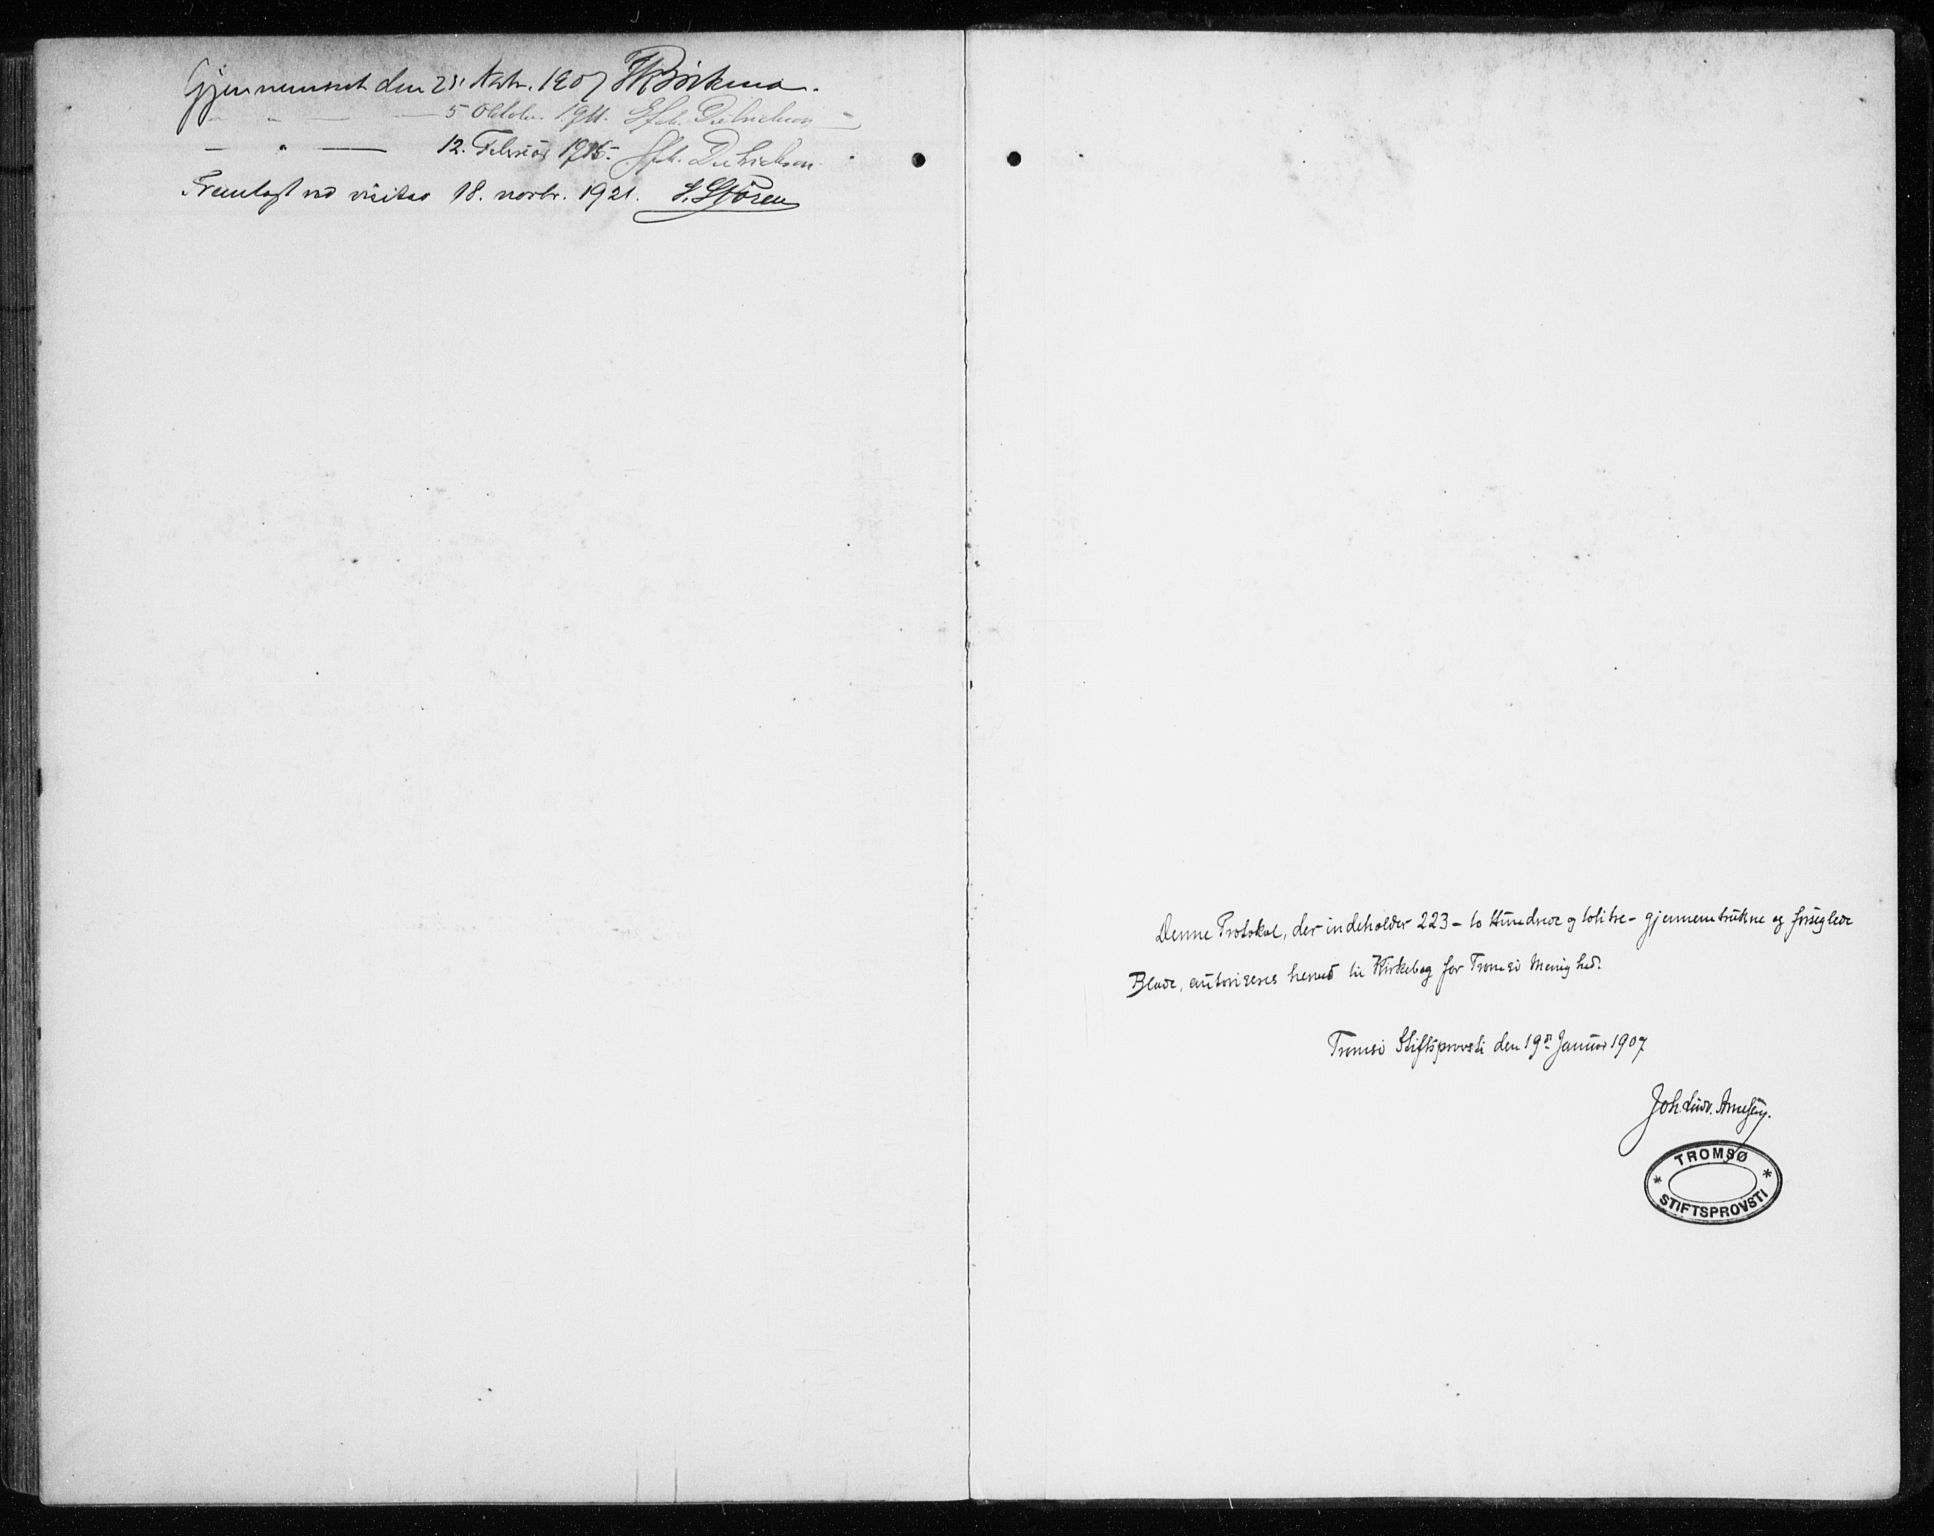 SATØ, Tromsø sokneprestkontor/stiftsprosti/domprosti, G/Ga/L0018kirke: Ministerialbok nr. 18, 1907-1917